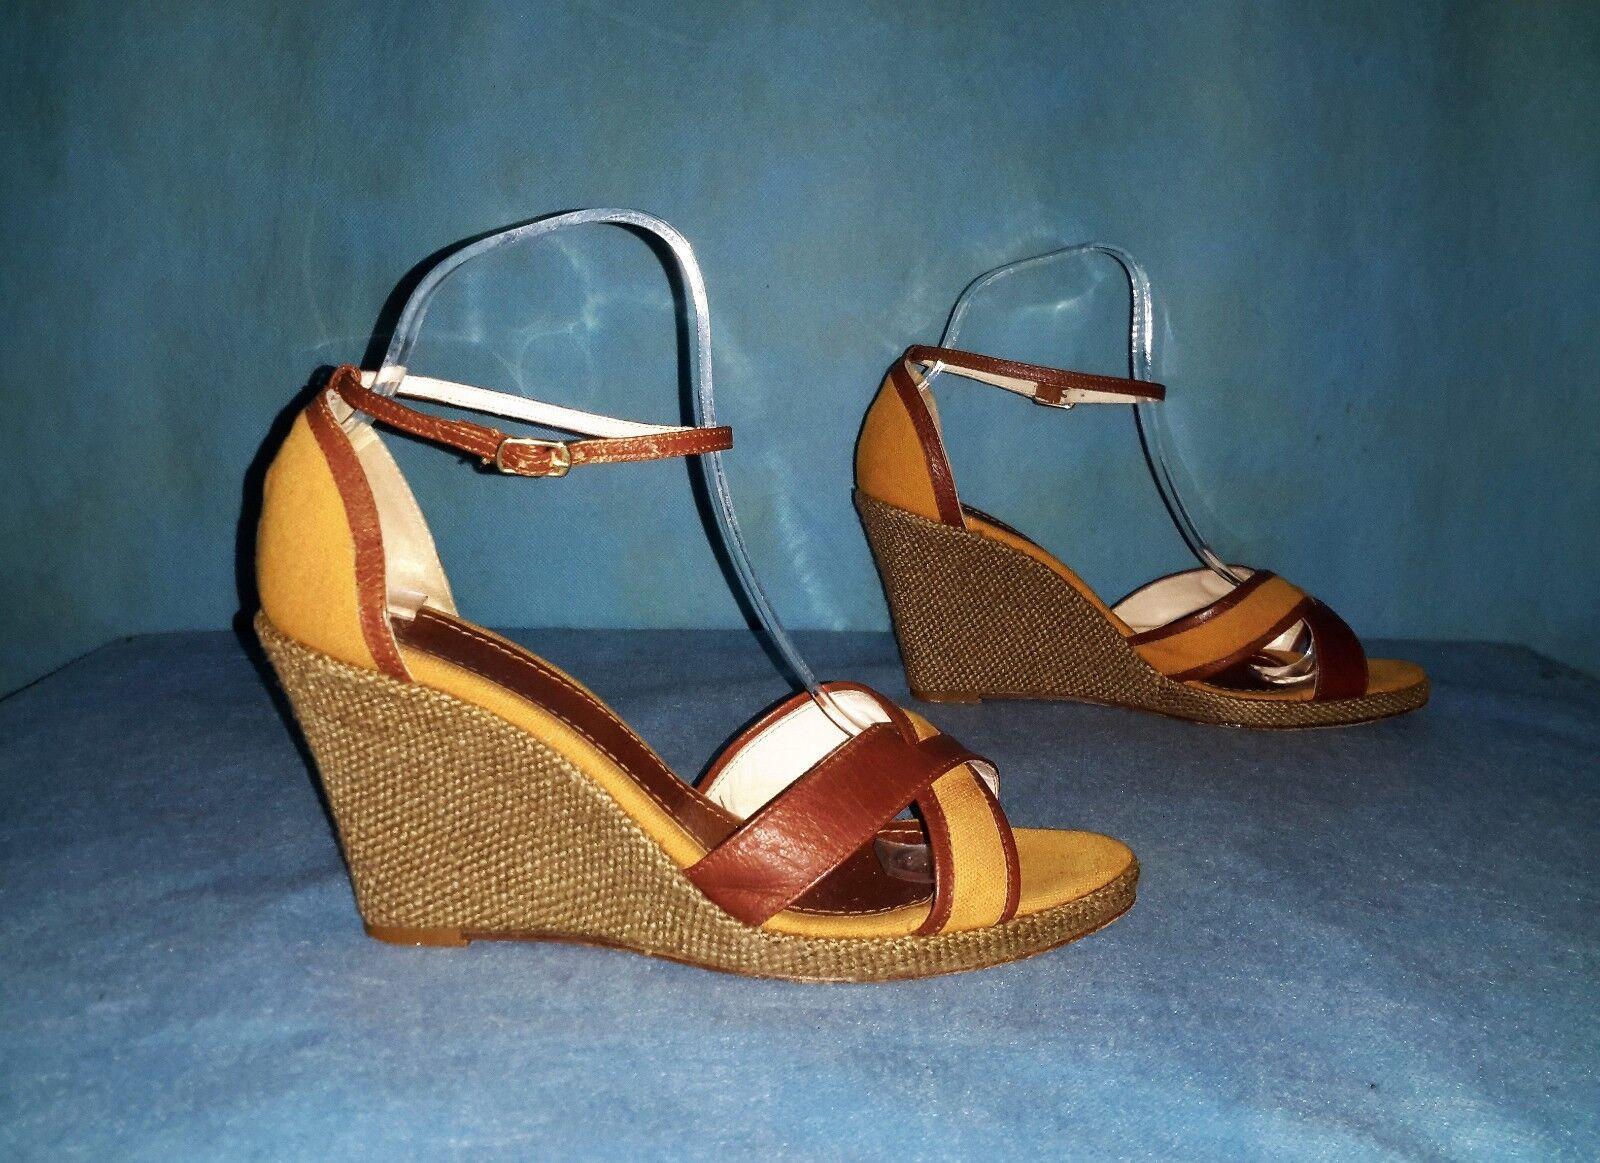 Sandali con zeppa MAX MARA e pelle e MARA tela p 38 ottima qualità 1d17b1